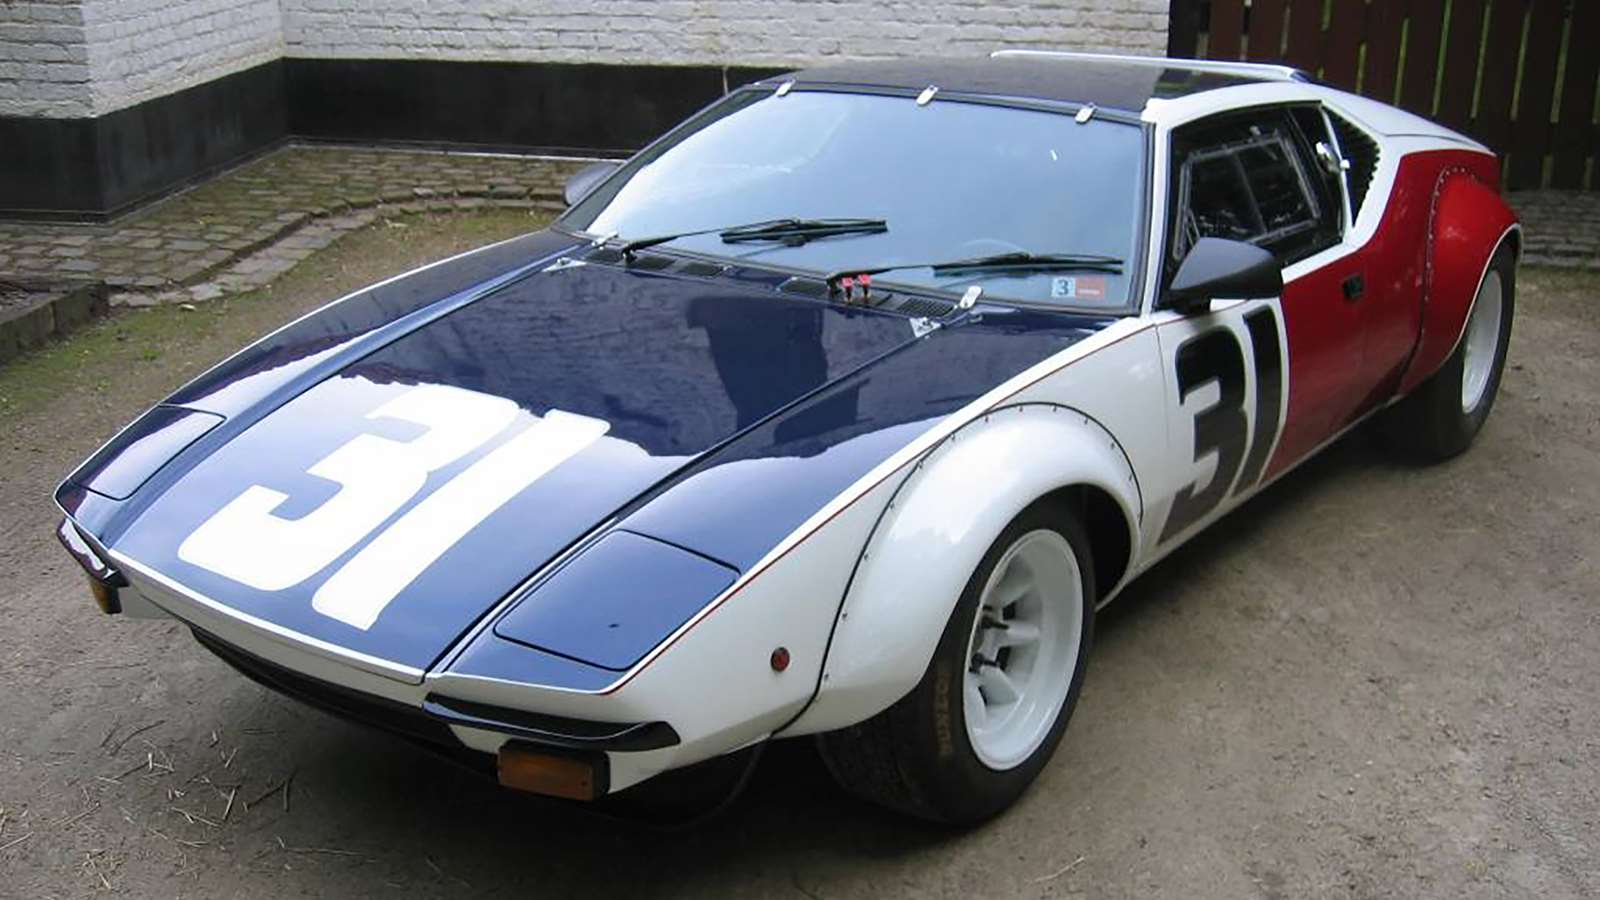 Dan Trent Is The De Tomaso Pantera The Best Value 70s Supercar